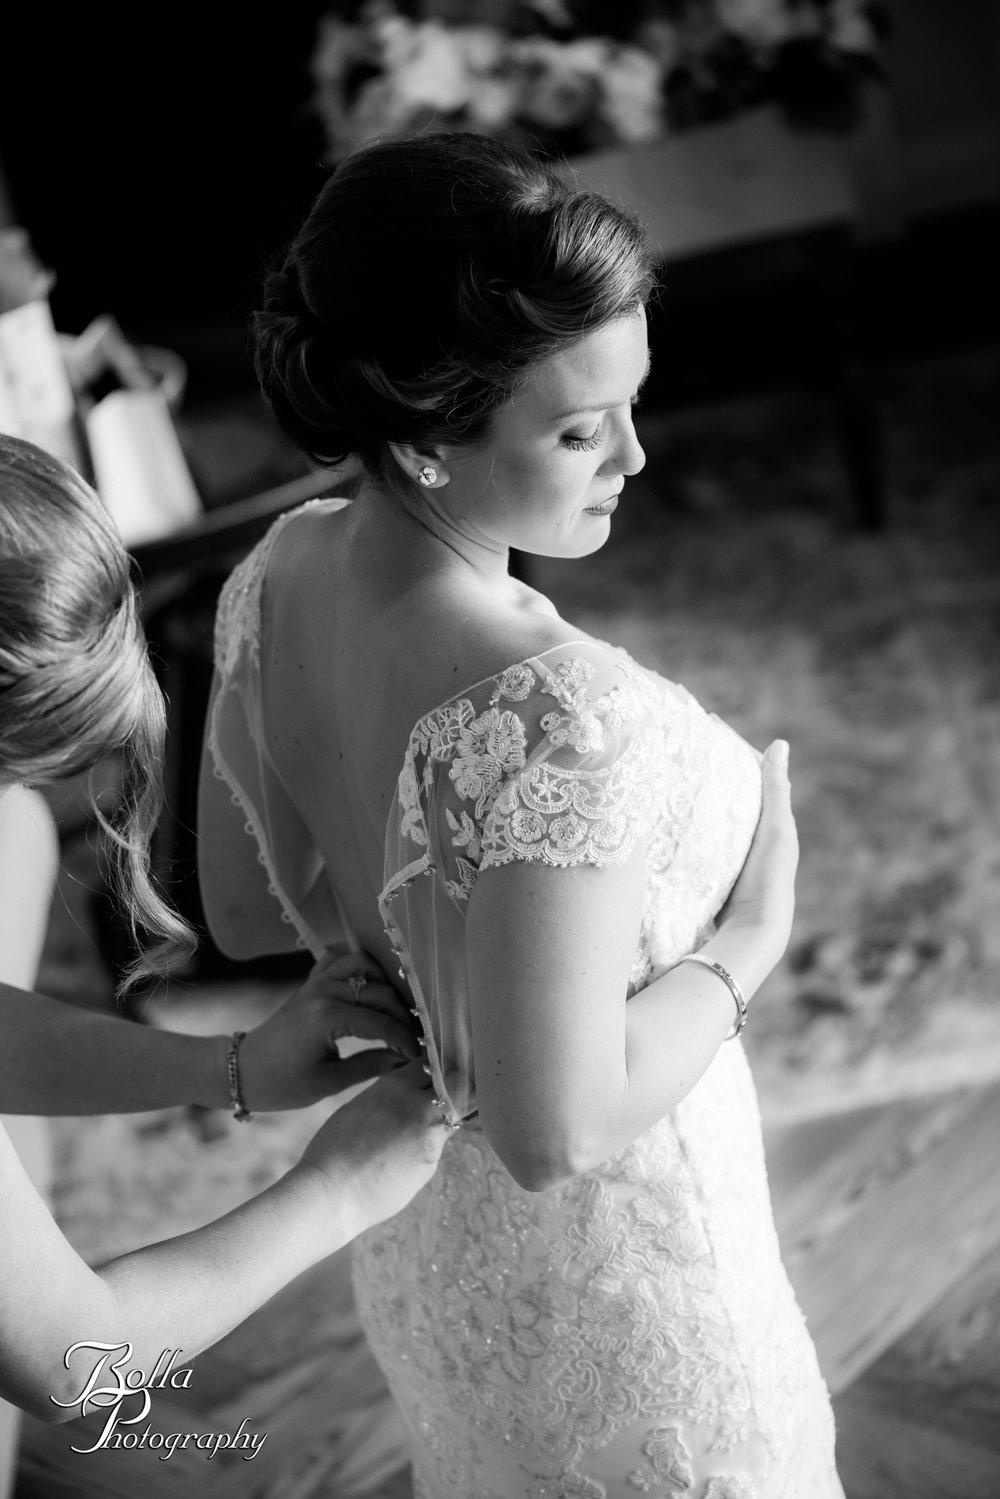 Bolla_photography_edwardsville_wedding_photographer_st_louis_weddings_Chaumette_winery_Mikusch-0093.jpg